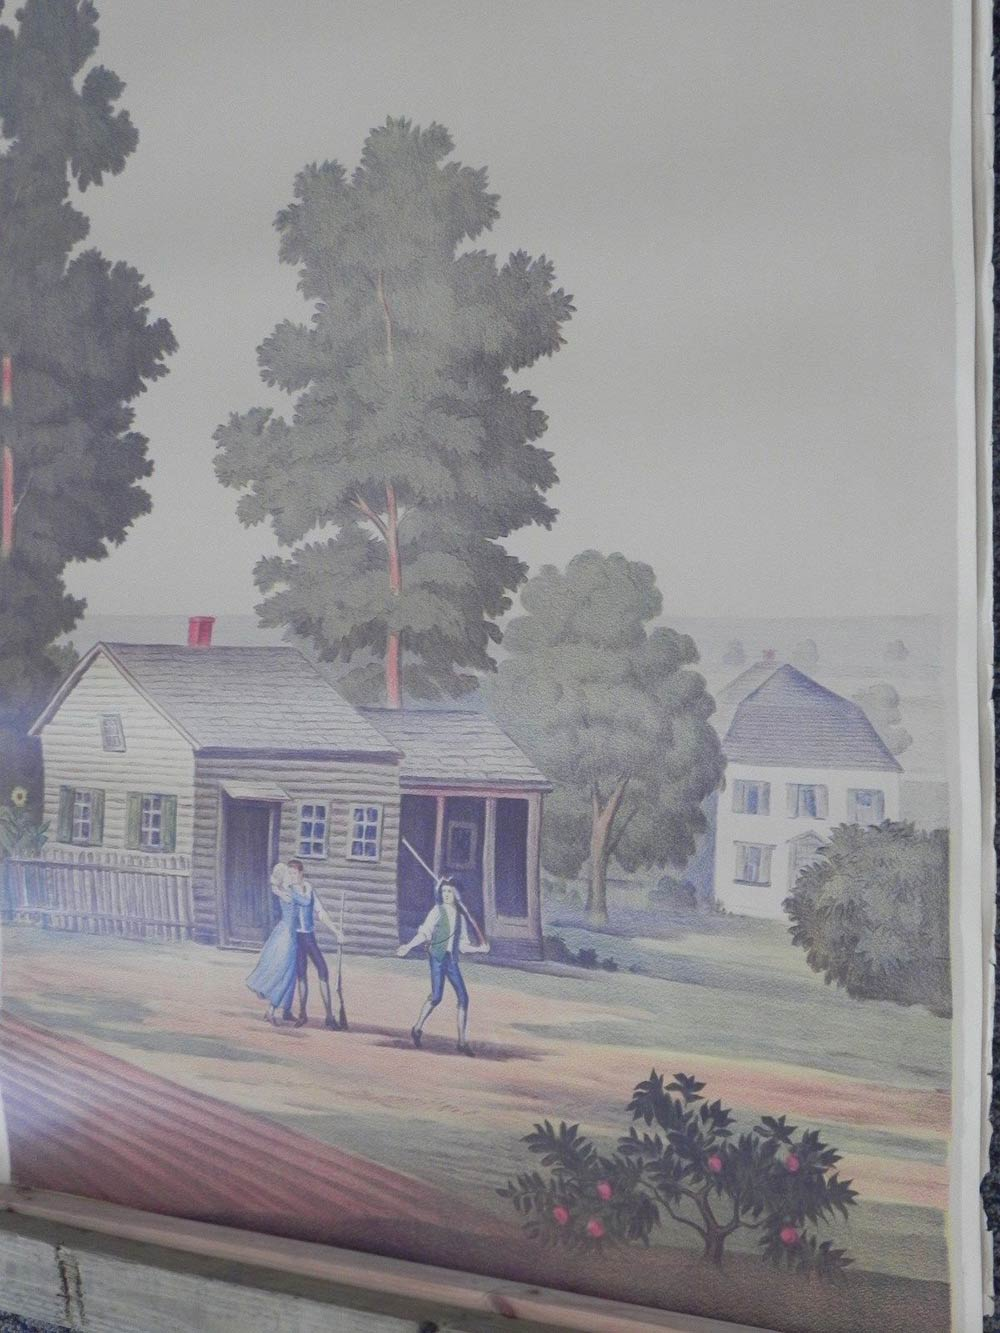 Full room vintage wallpaper murals by The Schmitz Horning Co   Retro 1000x1333